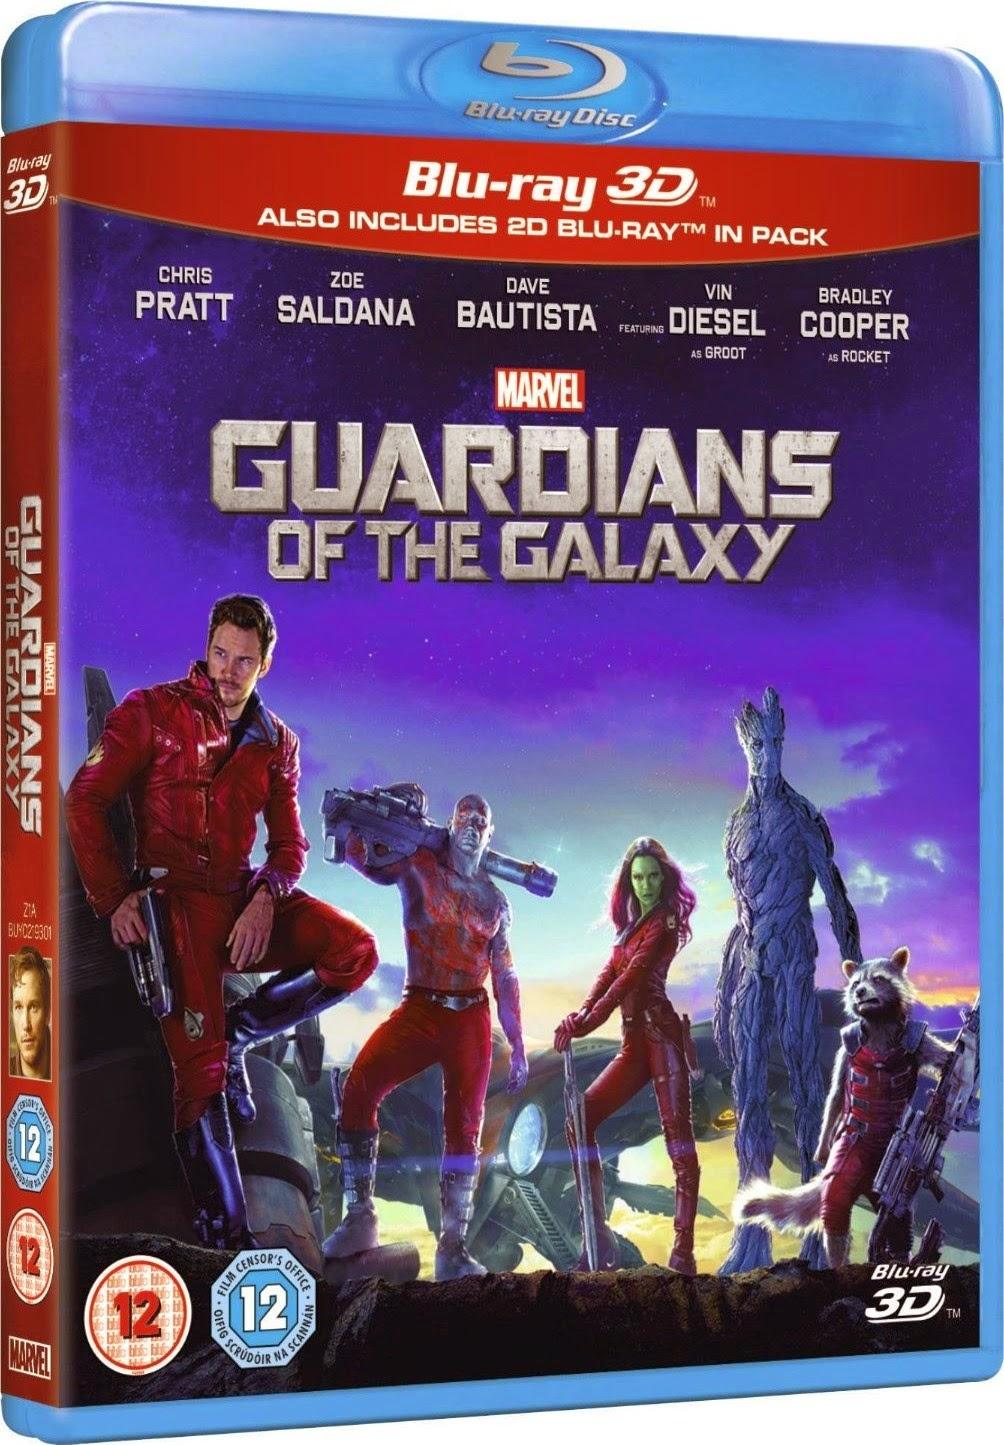 Guardianes De La Galaxia (2014) 1080p 2D y 3D BD25